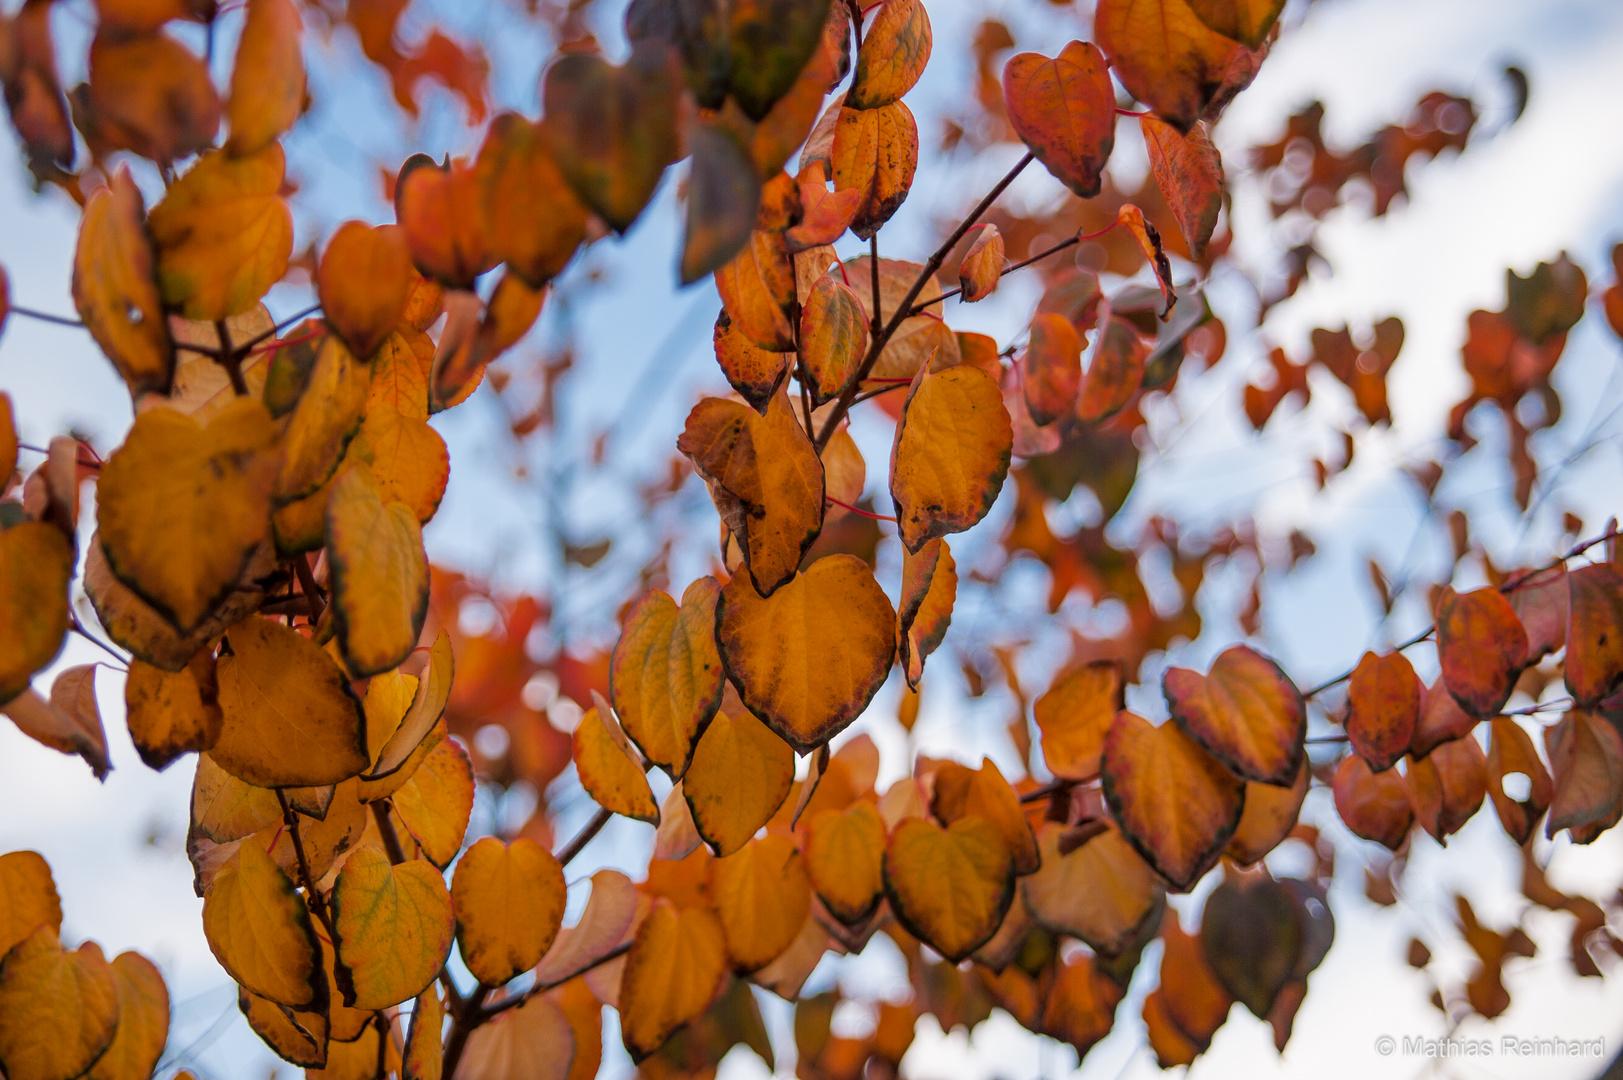 Katsurabaum kuchenbaum lebkuchenbaum foto bild pflanzen pilze flechten b ume blatt - Lebkuchenbaum kaufen ...